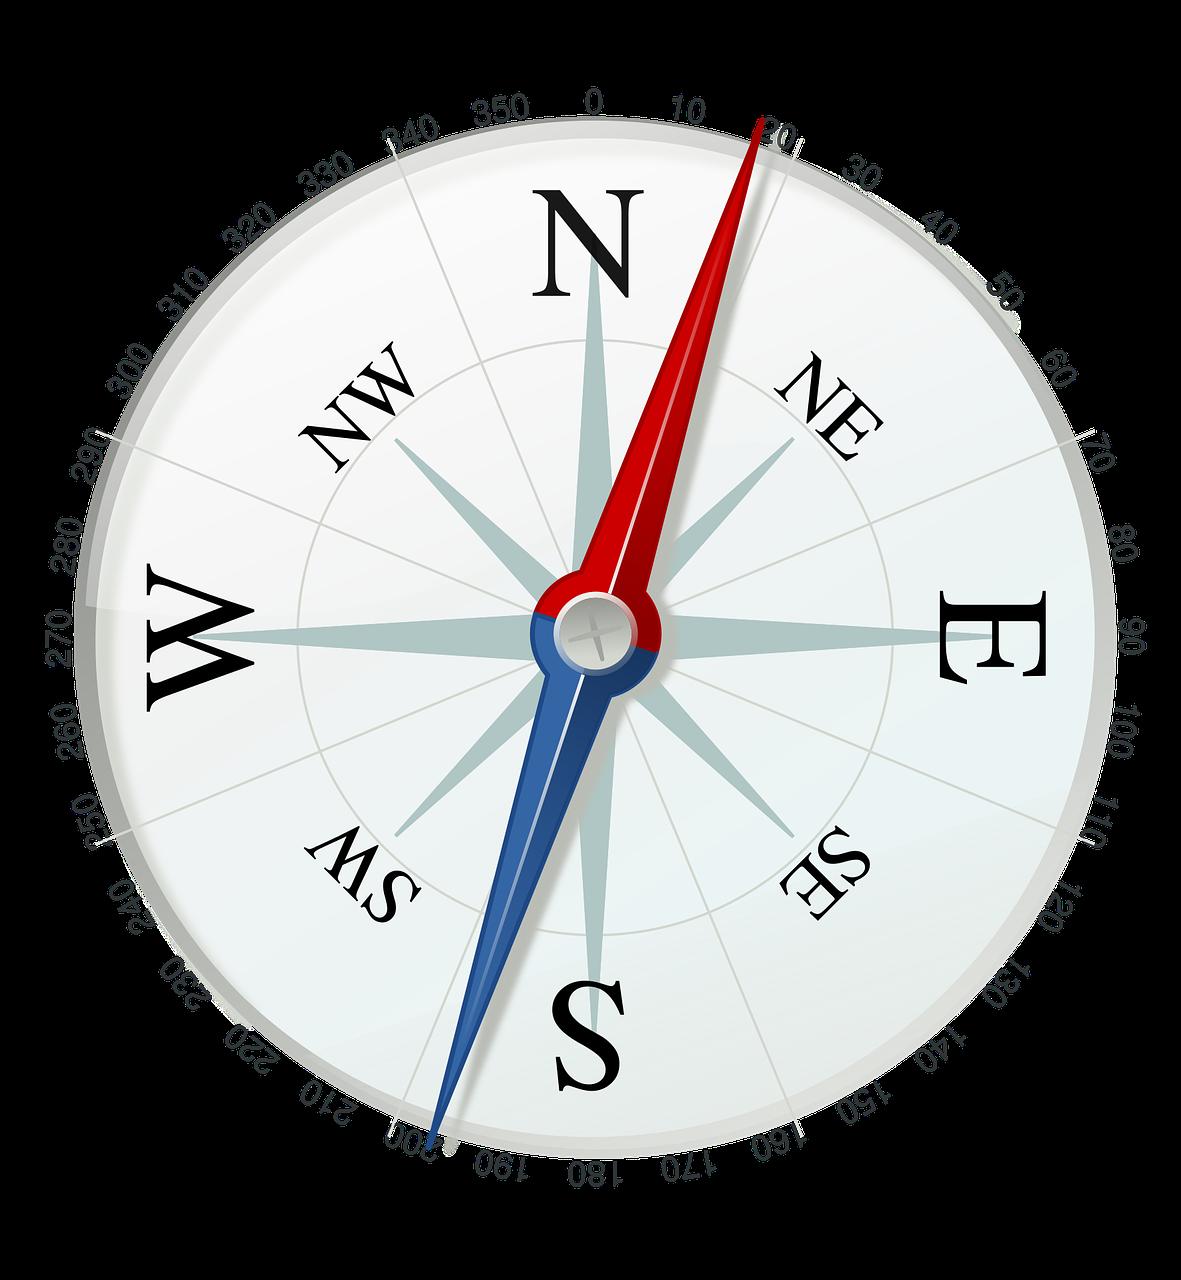 Clipart clock retirement. Travel compass direction navigation